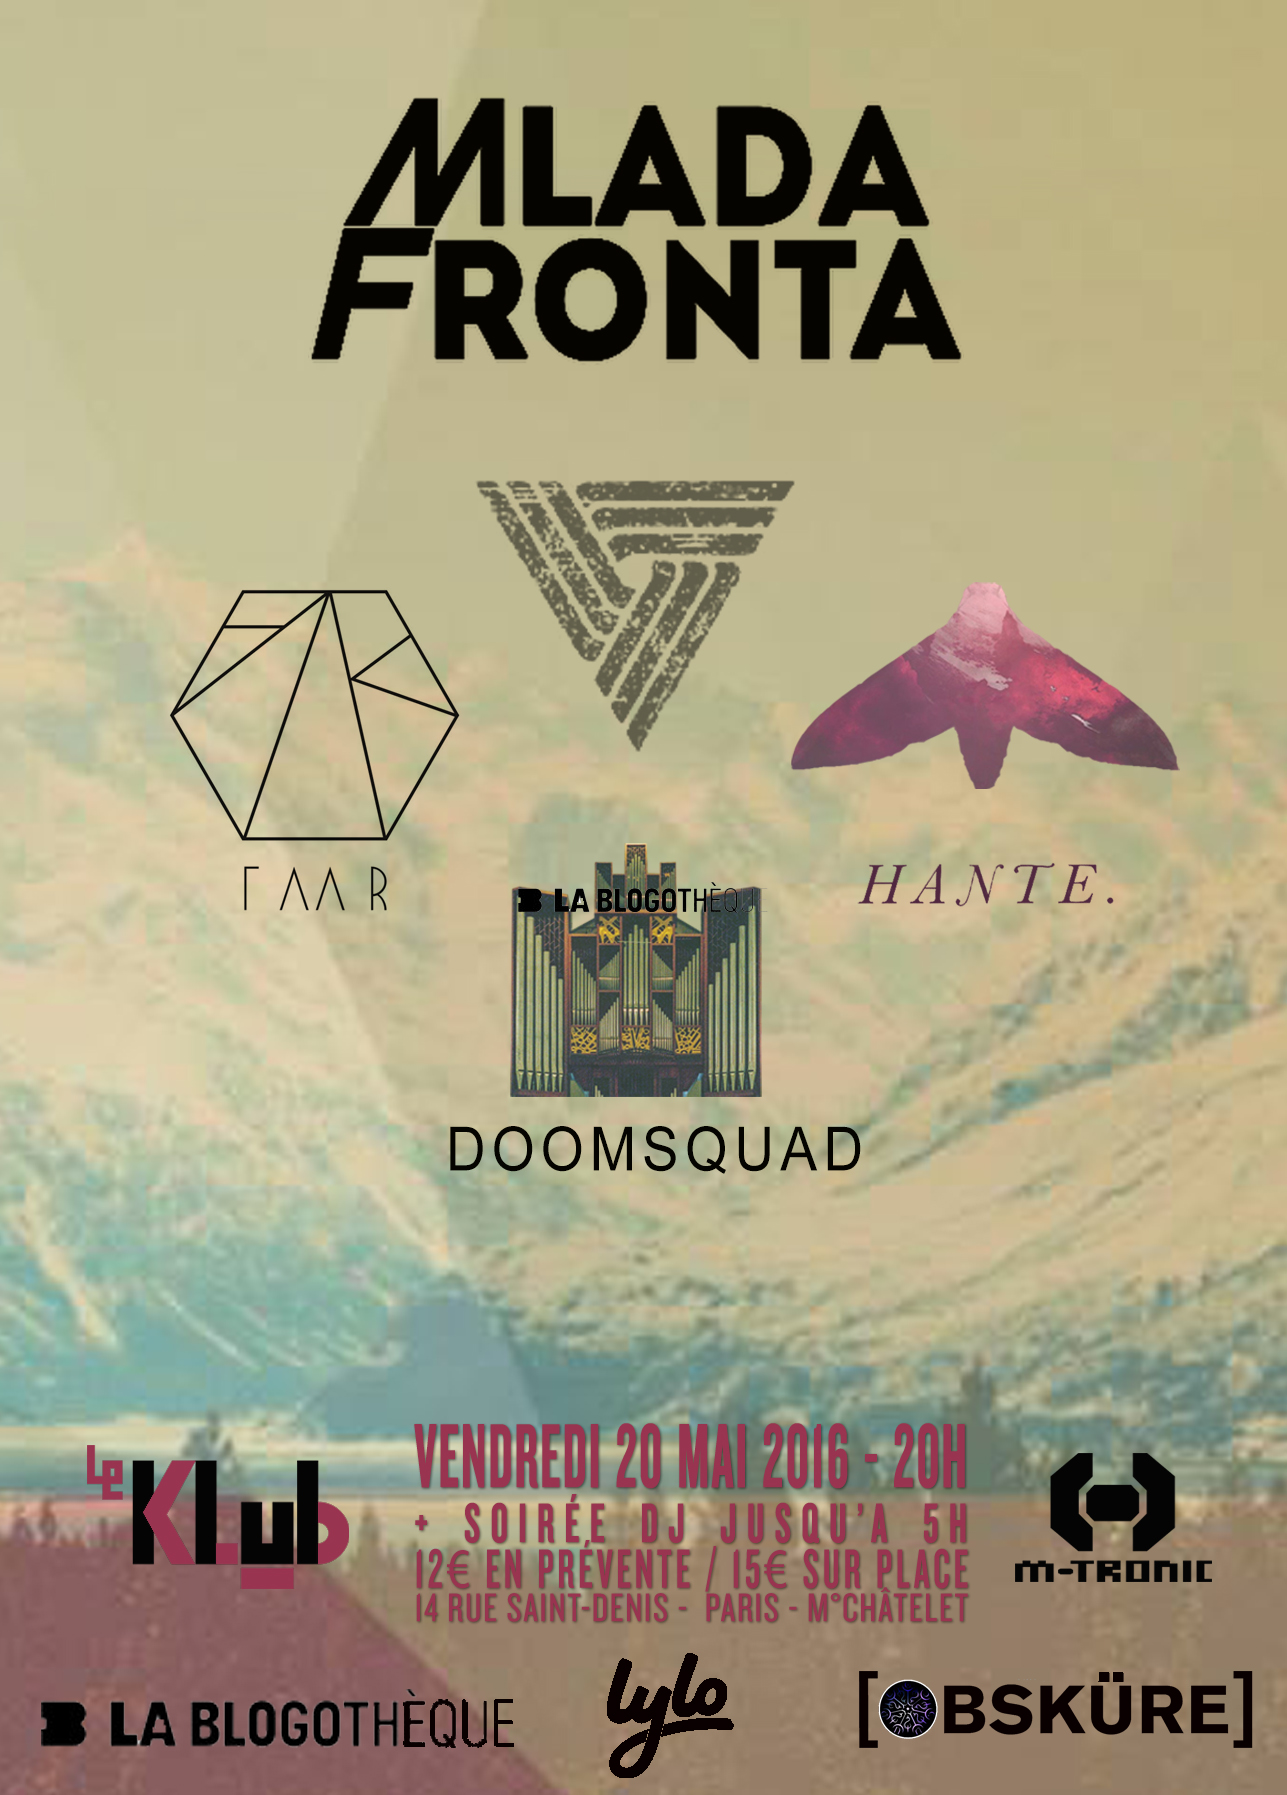 MLADA FRONTA + DOOMSQUAD + FAAR + HANTE